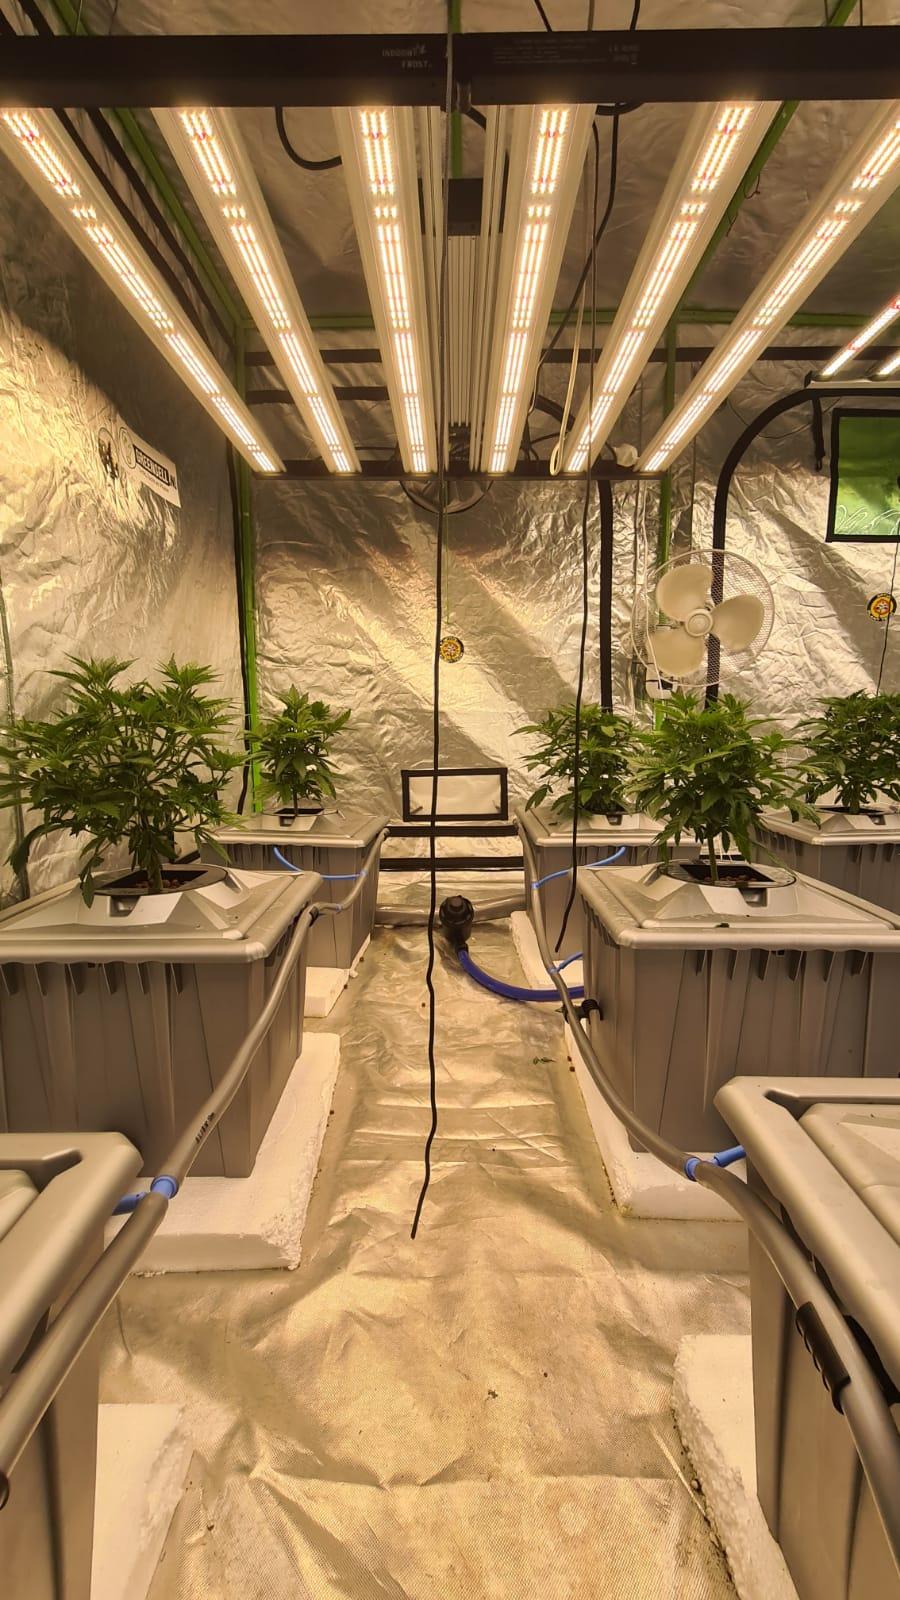 hydroponics hydro hydrocultuur wiet